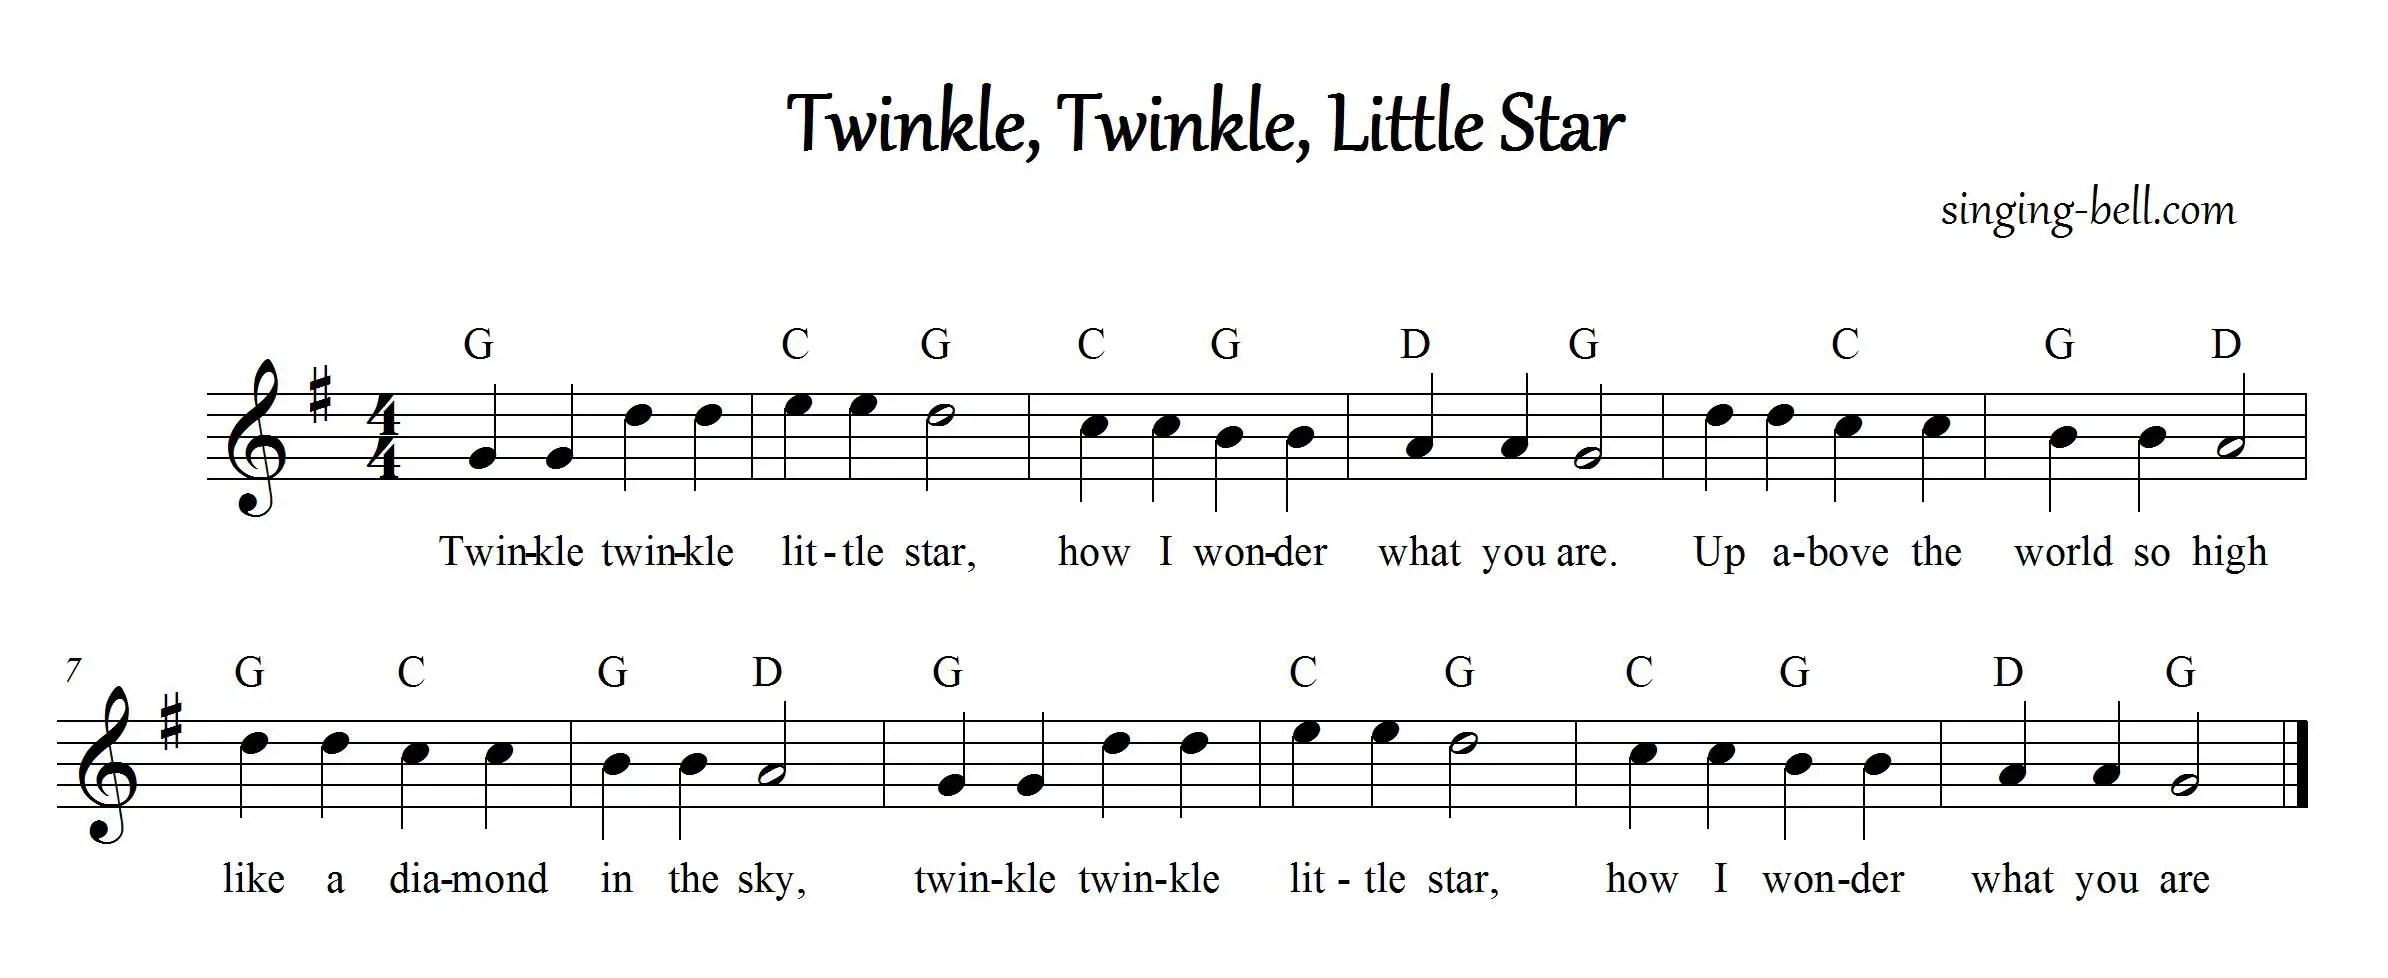 Free Nursery Rhymes Twinkle Twinkle Little Star